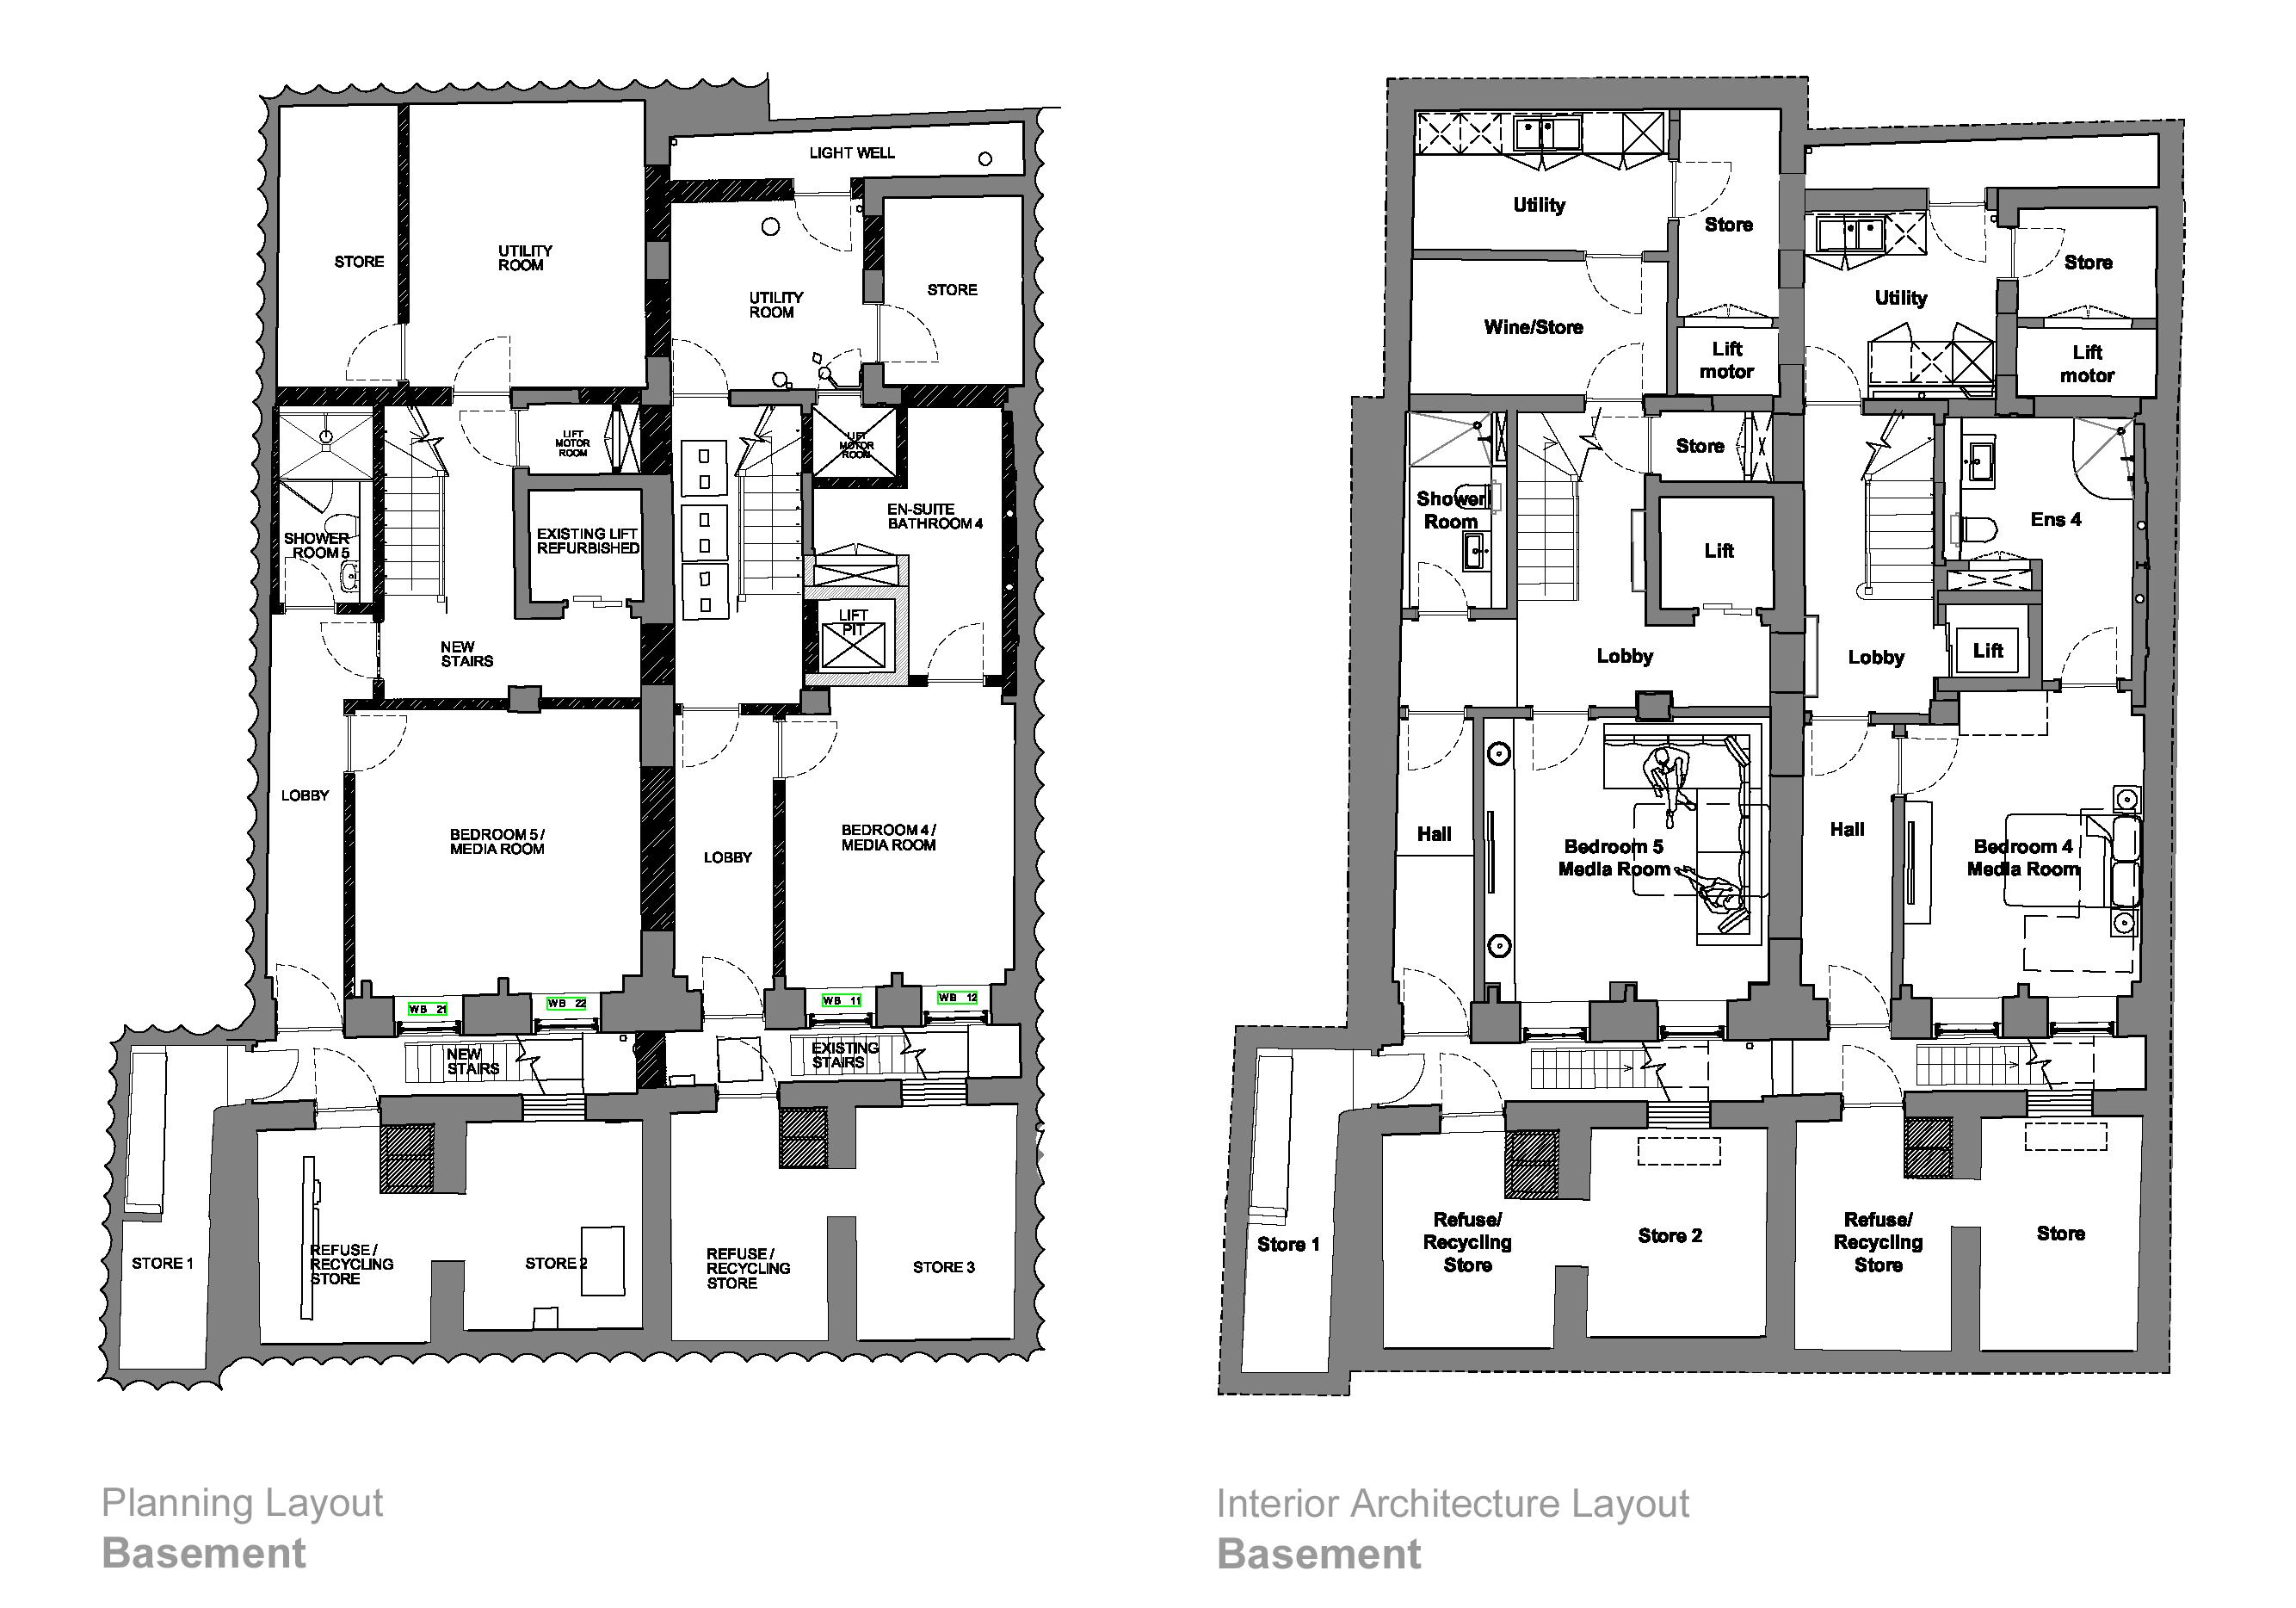 1 planning basement copy